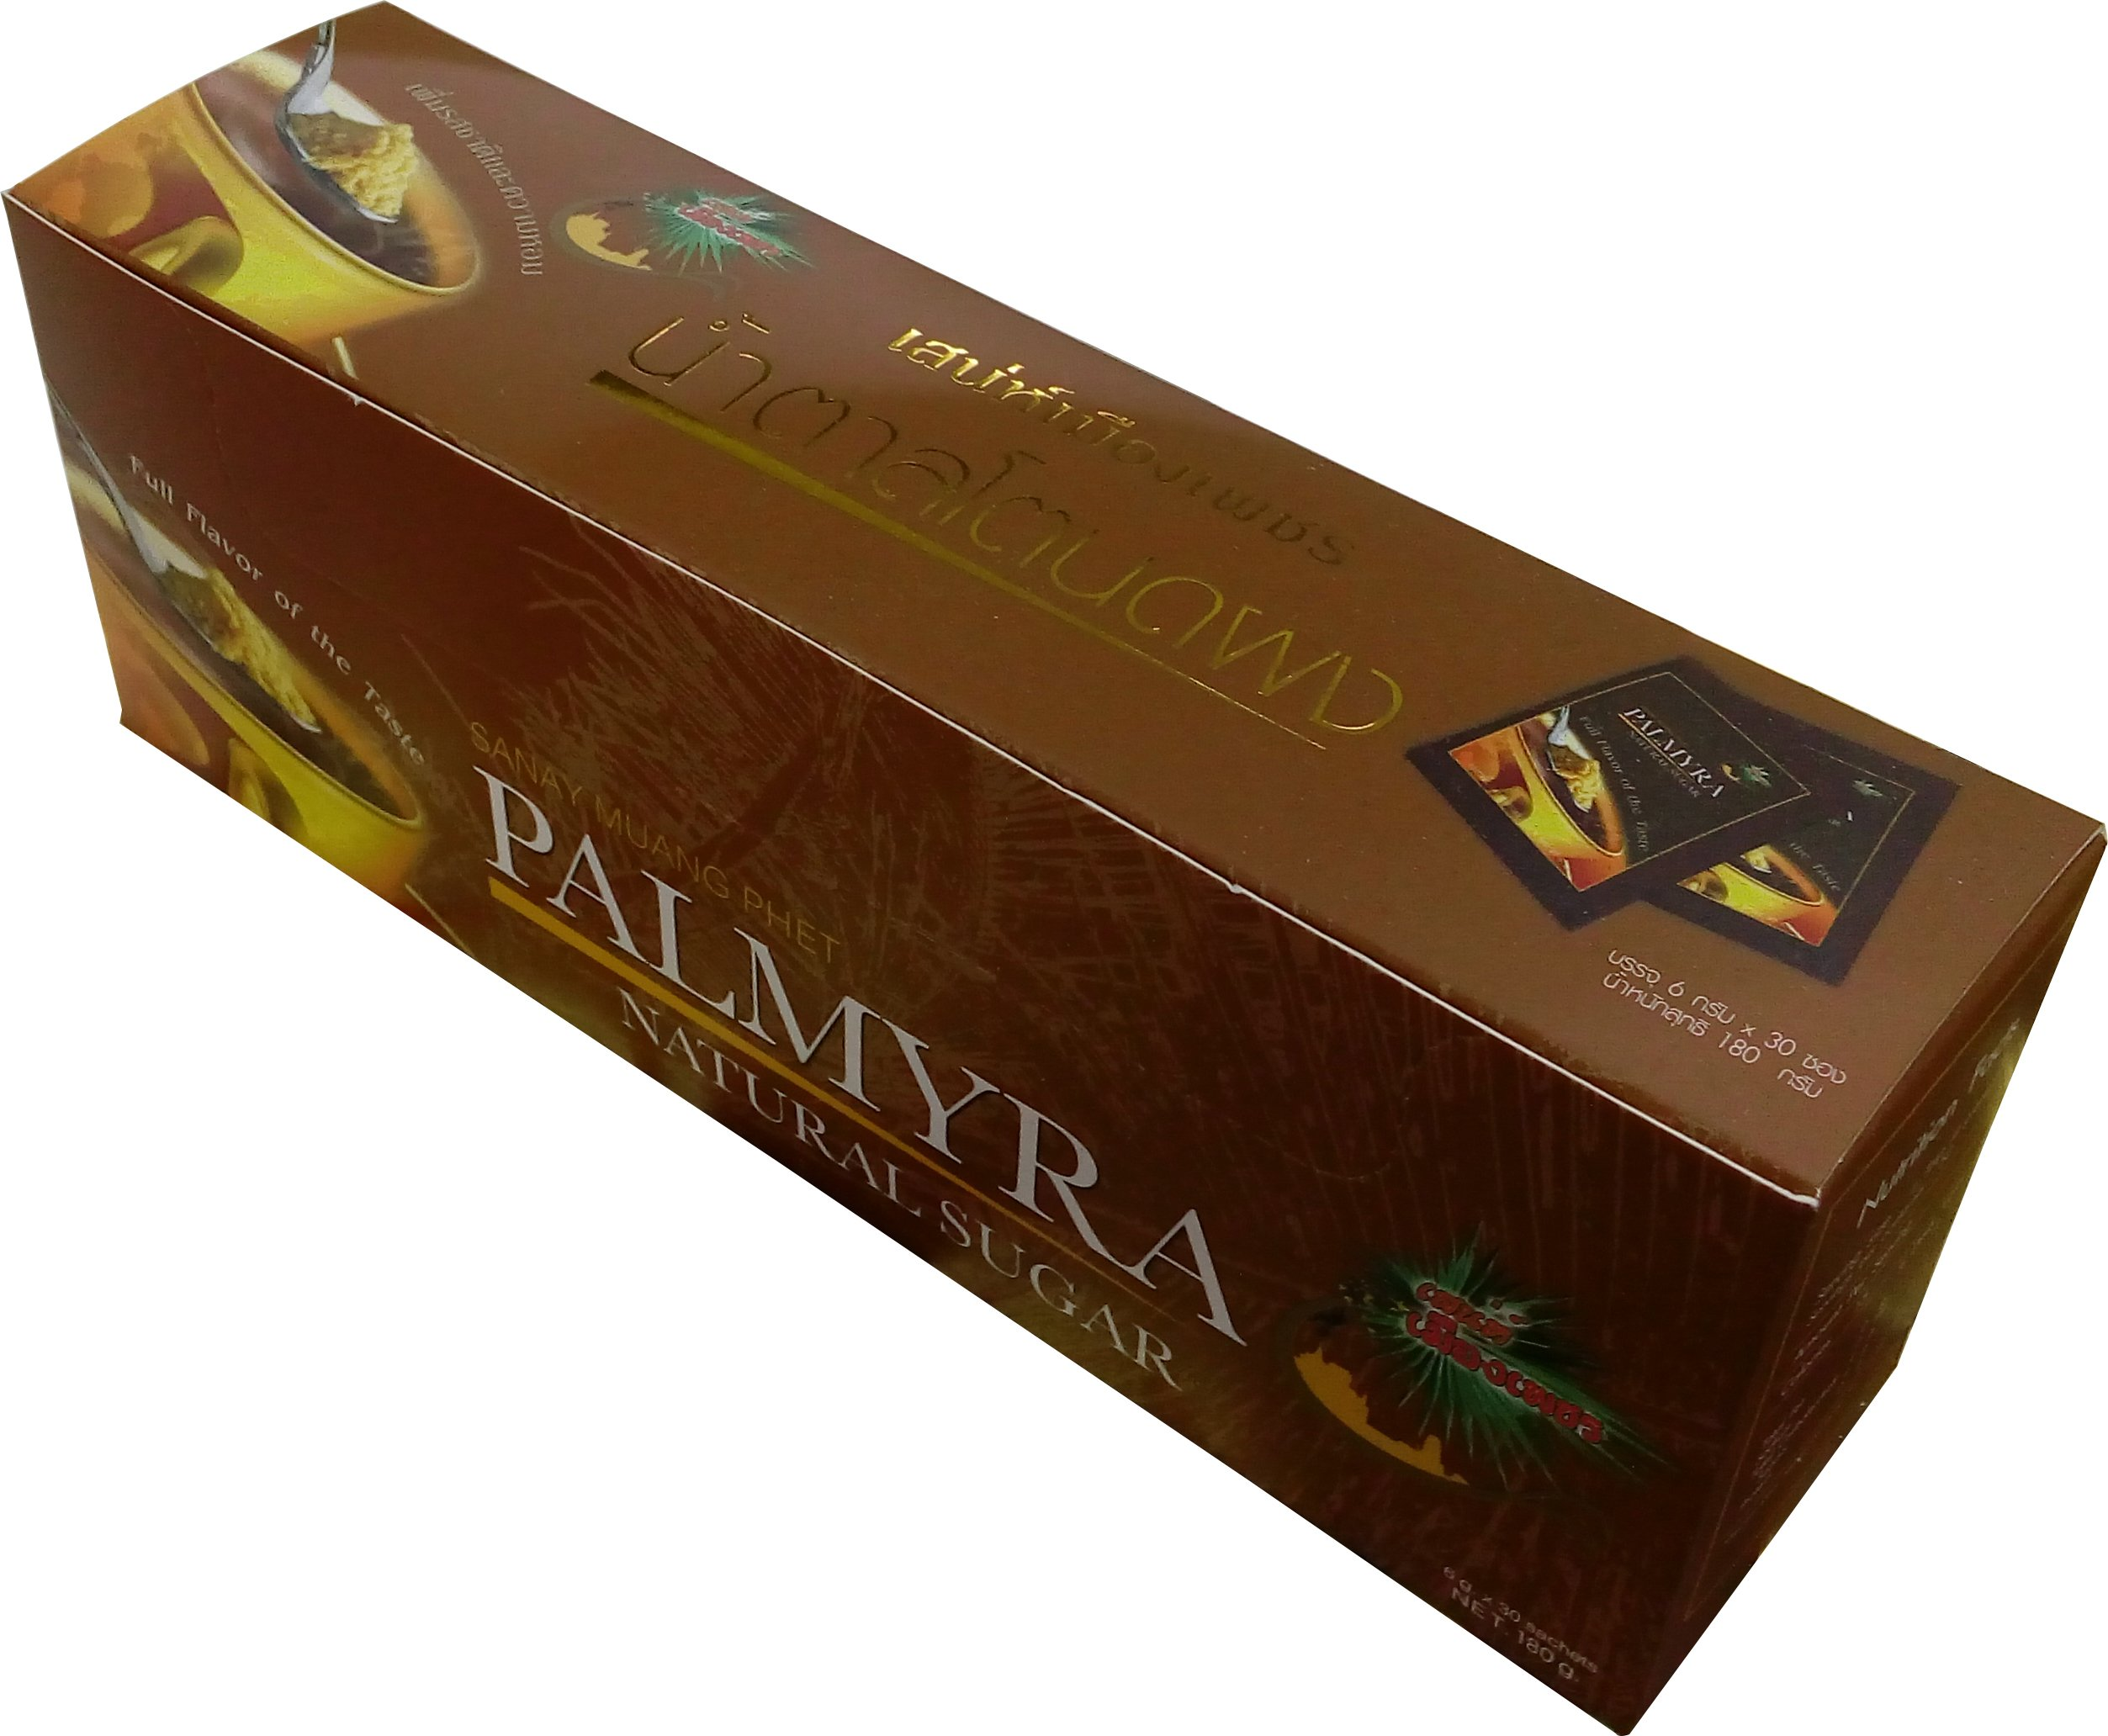 Sanay Muang Phet Palmera Jaggery Powder 6.34 Oz./30 Sachets